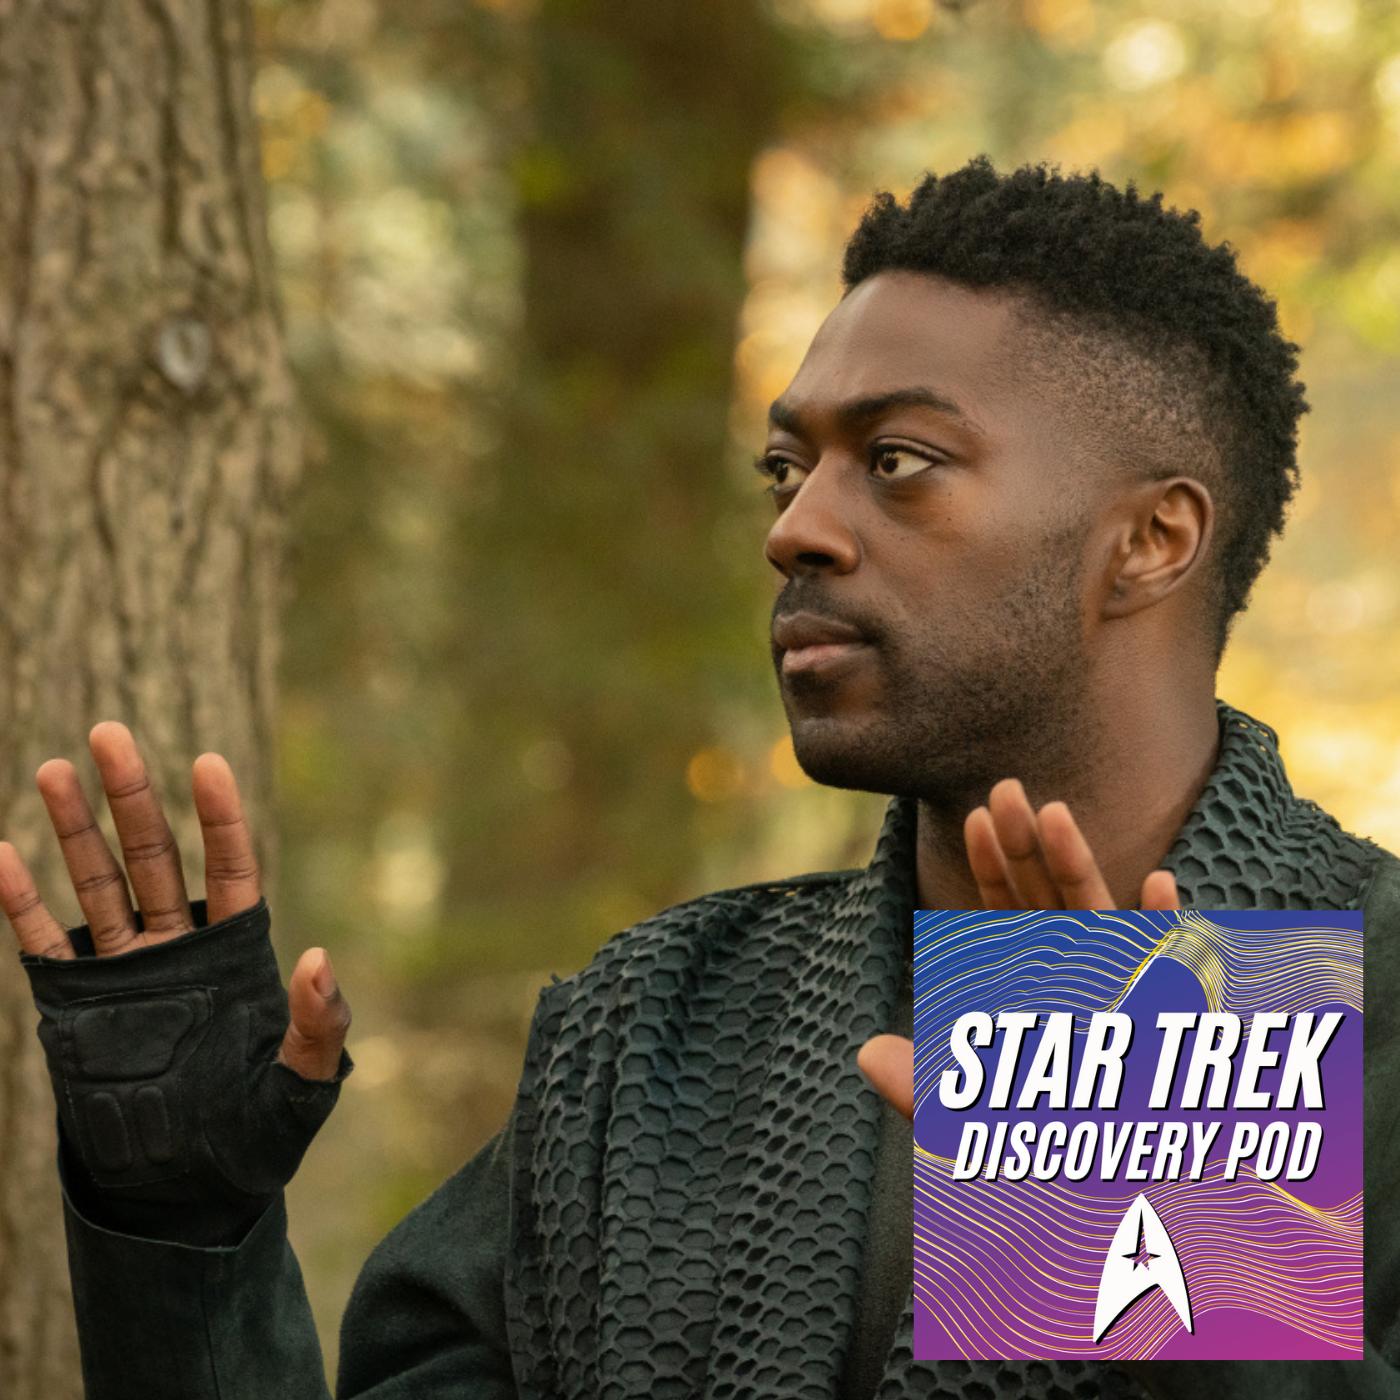 Star Trek Discovery Season 3 Episode 8 'The Sanctuary' Review